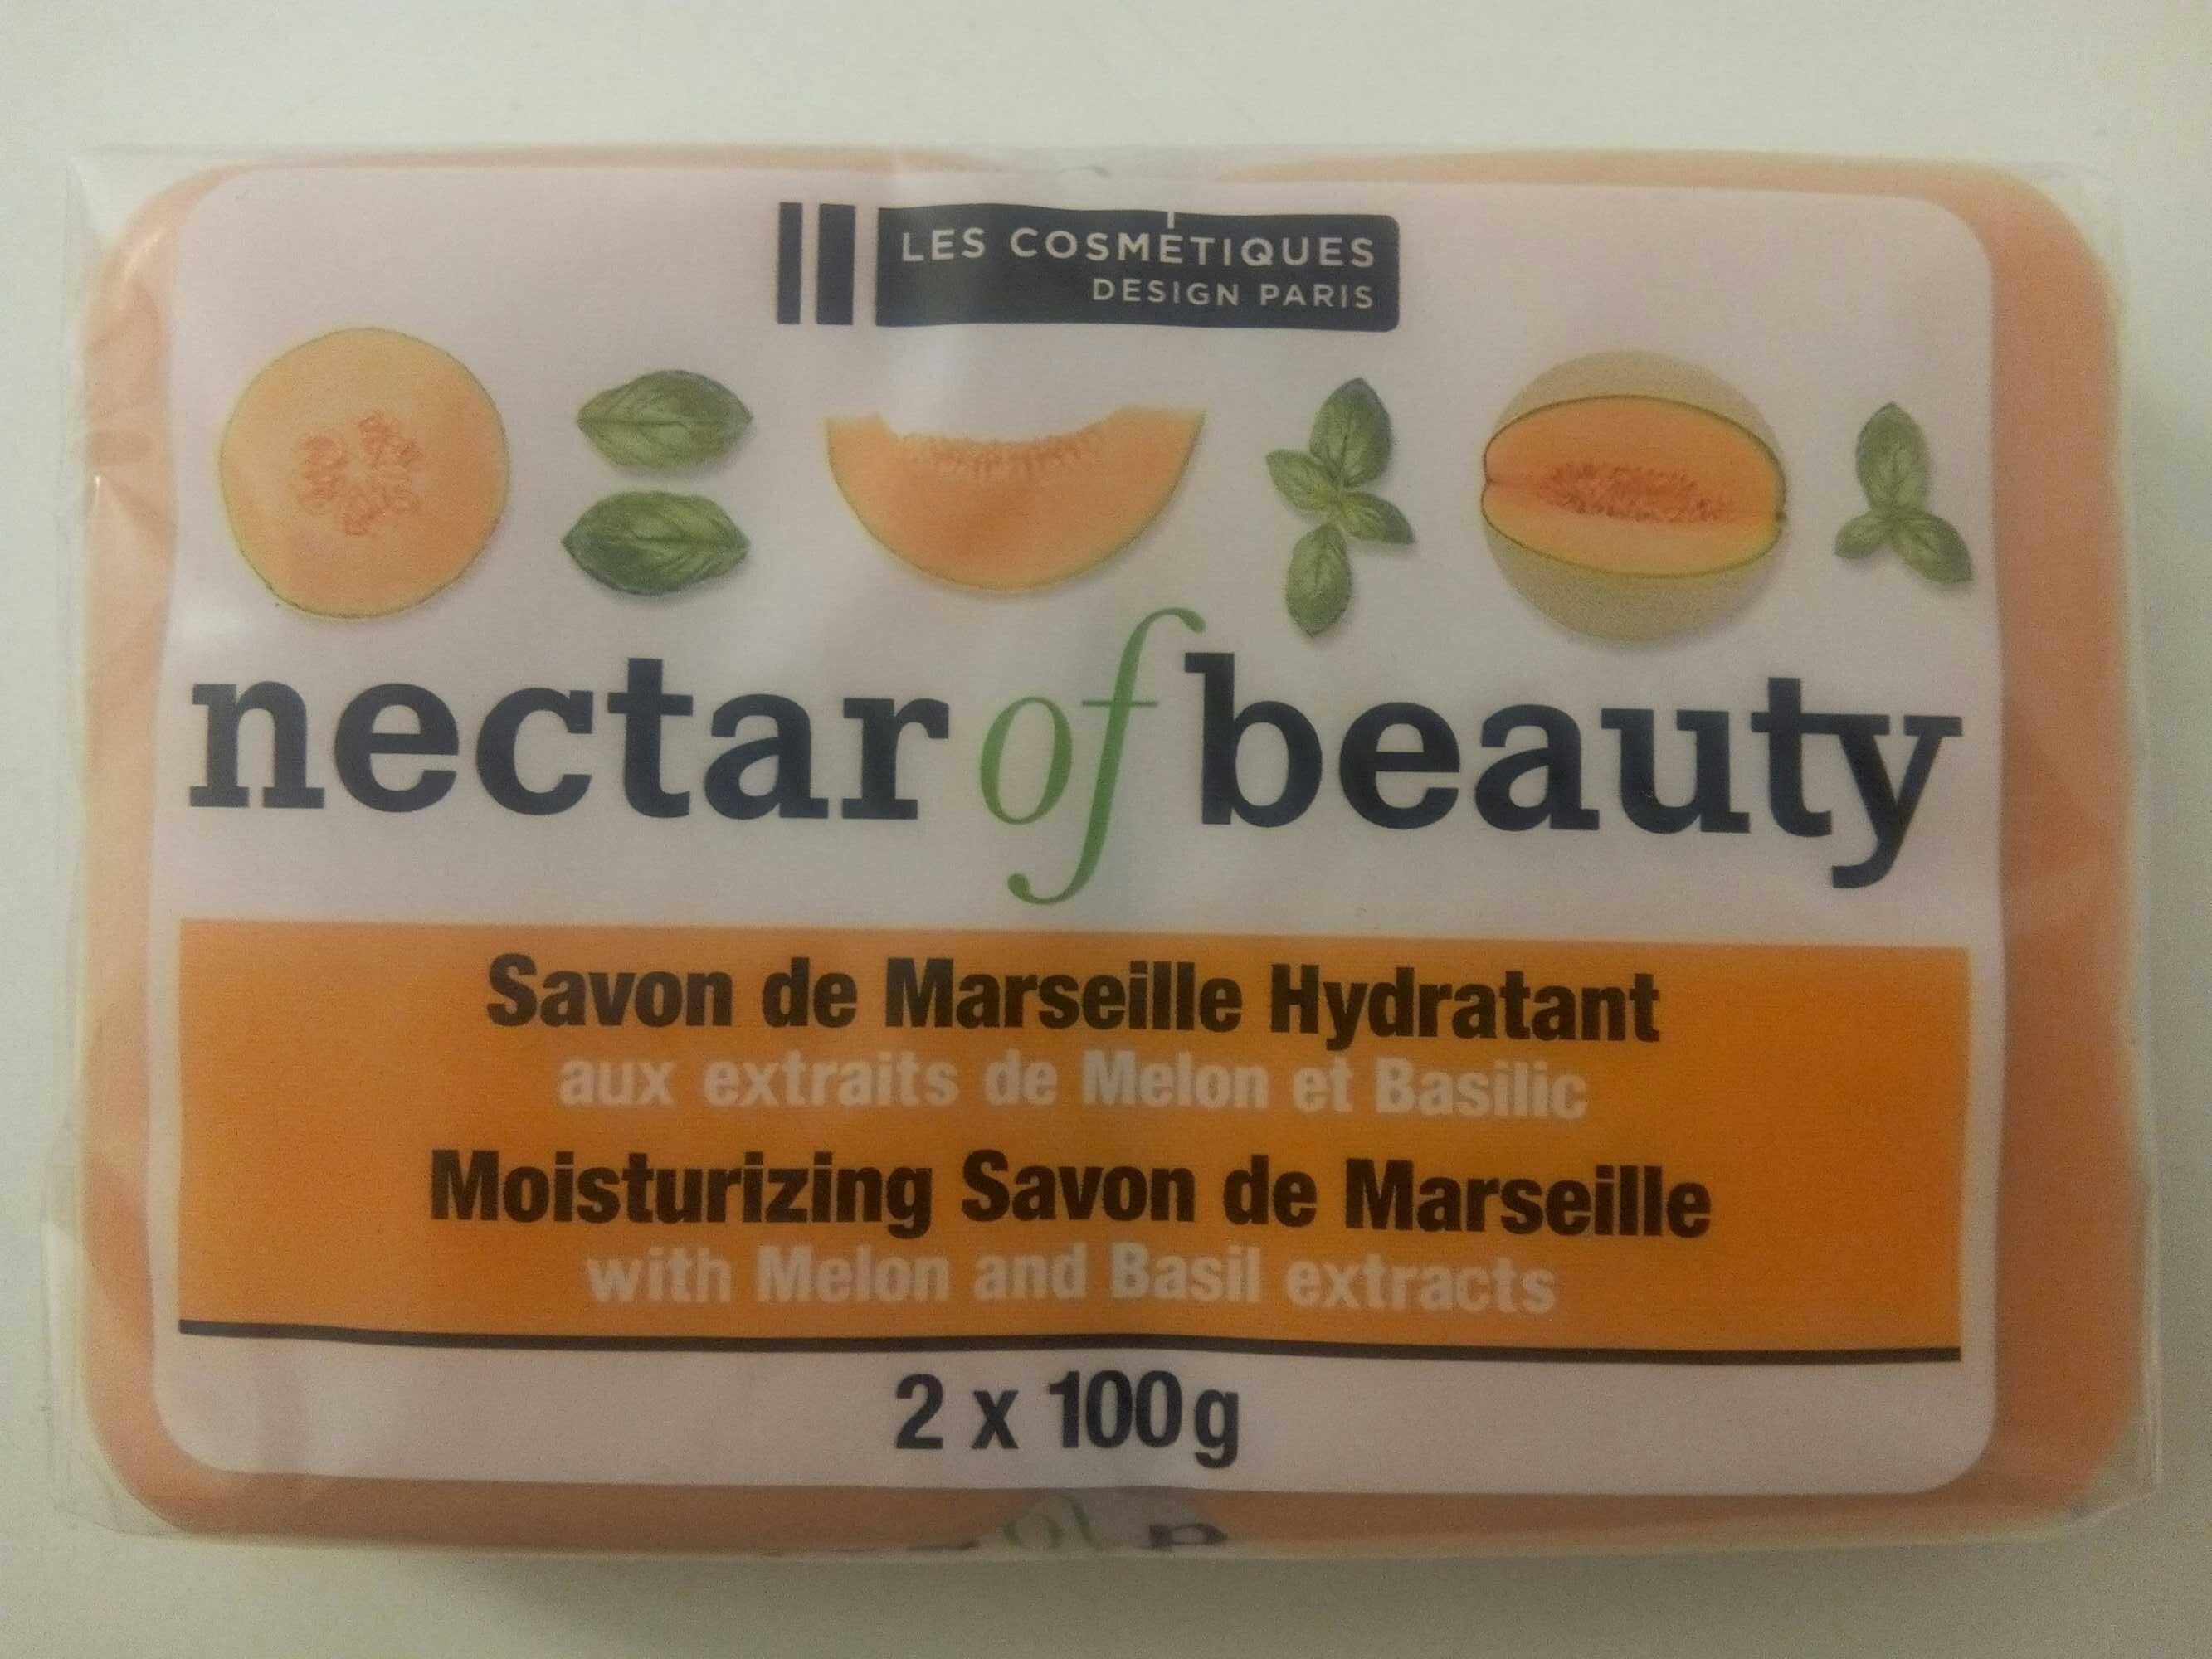 Savon de Marseille hydratant - Product